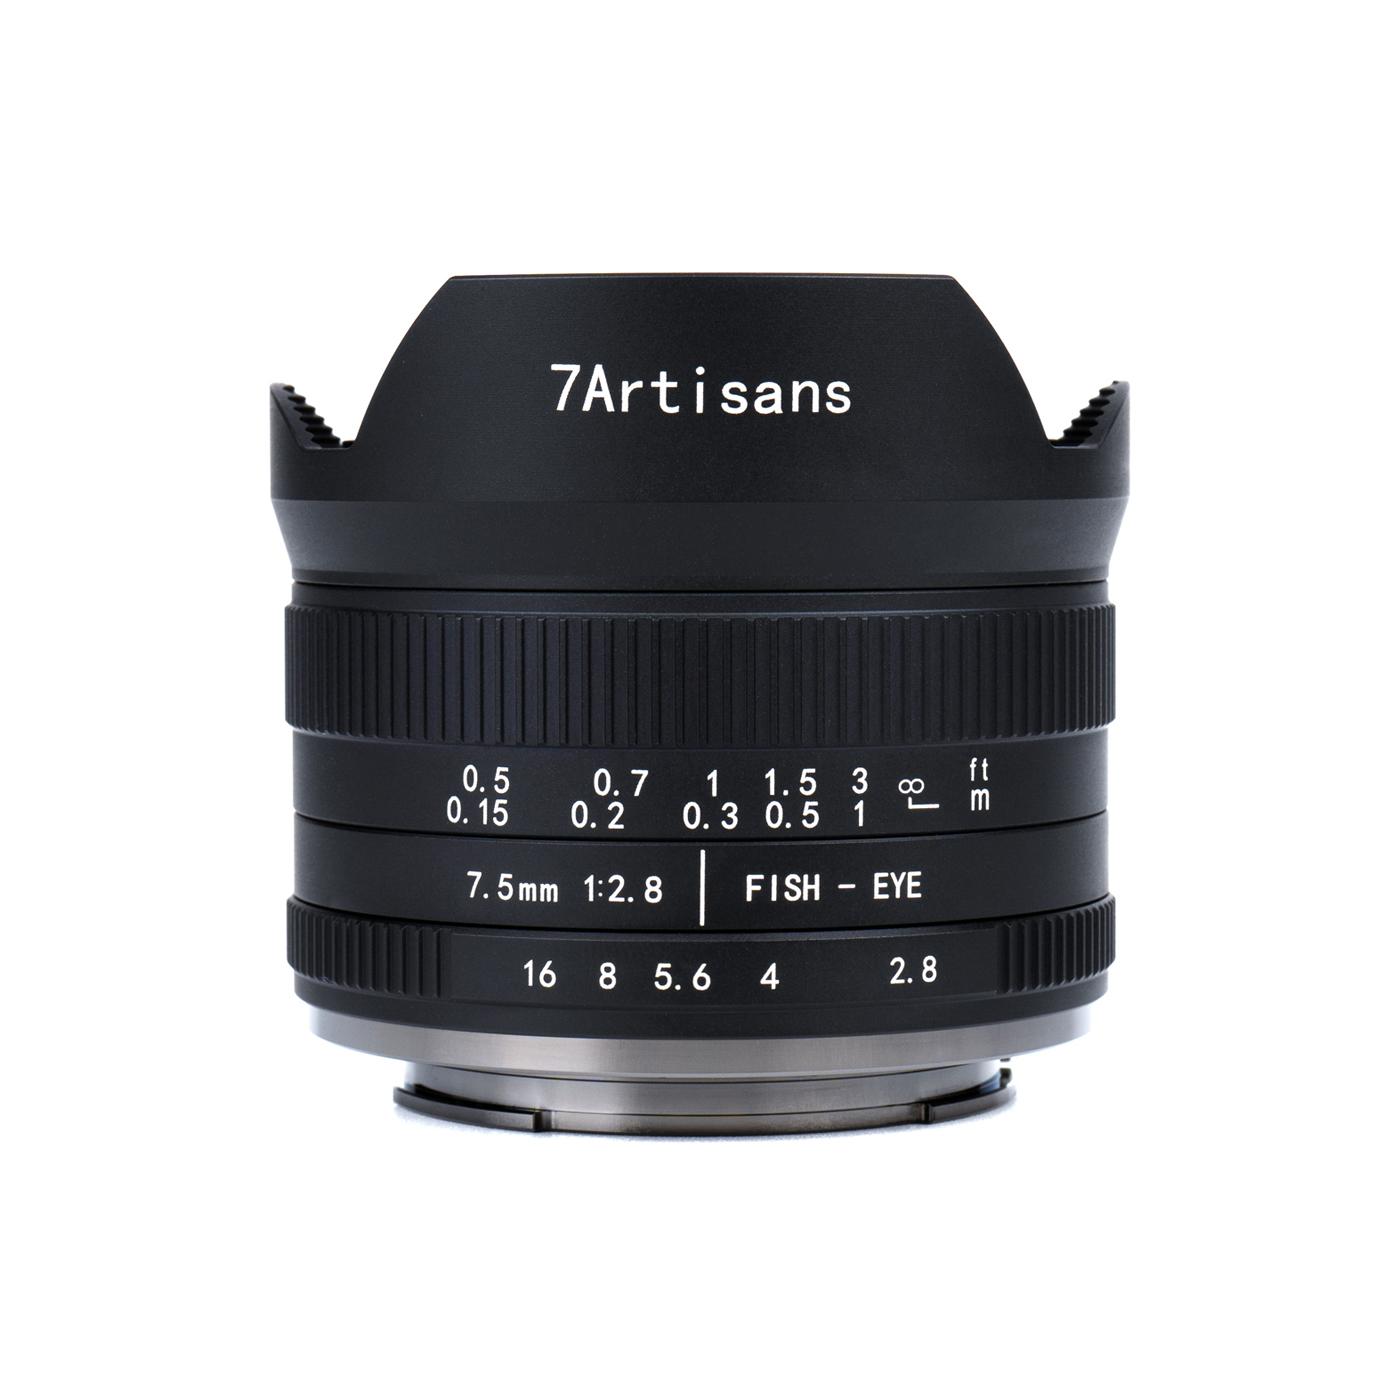 7Artisans 7,5 mm 1:2,8 II Fisheye für Fujifilm X